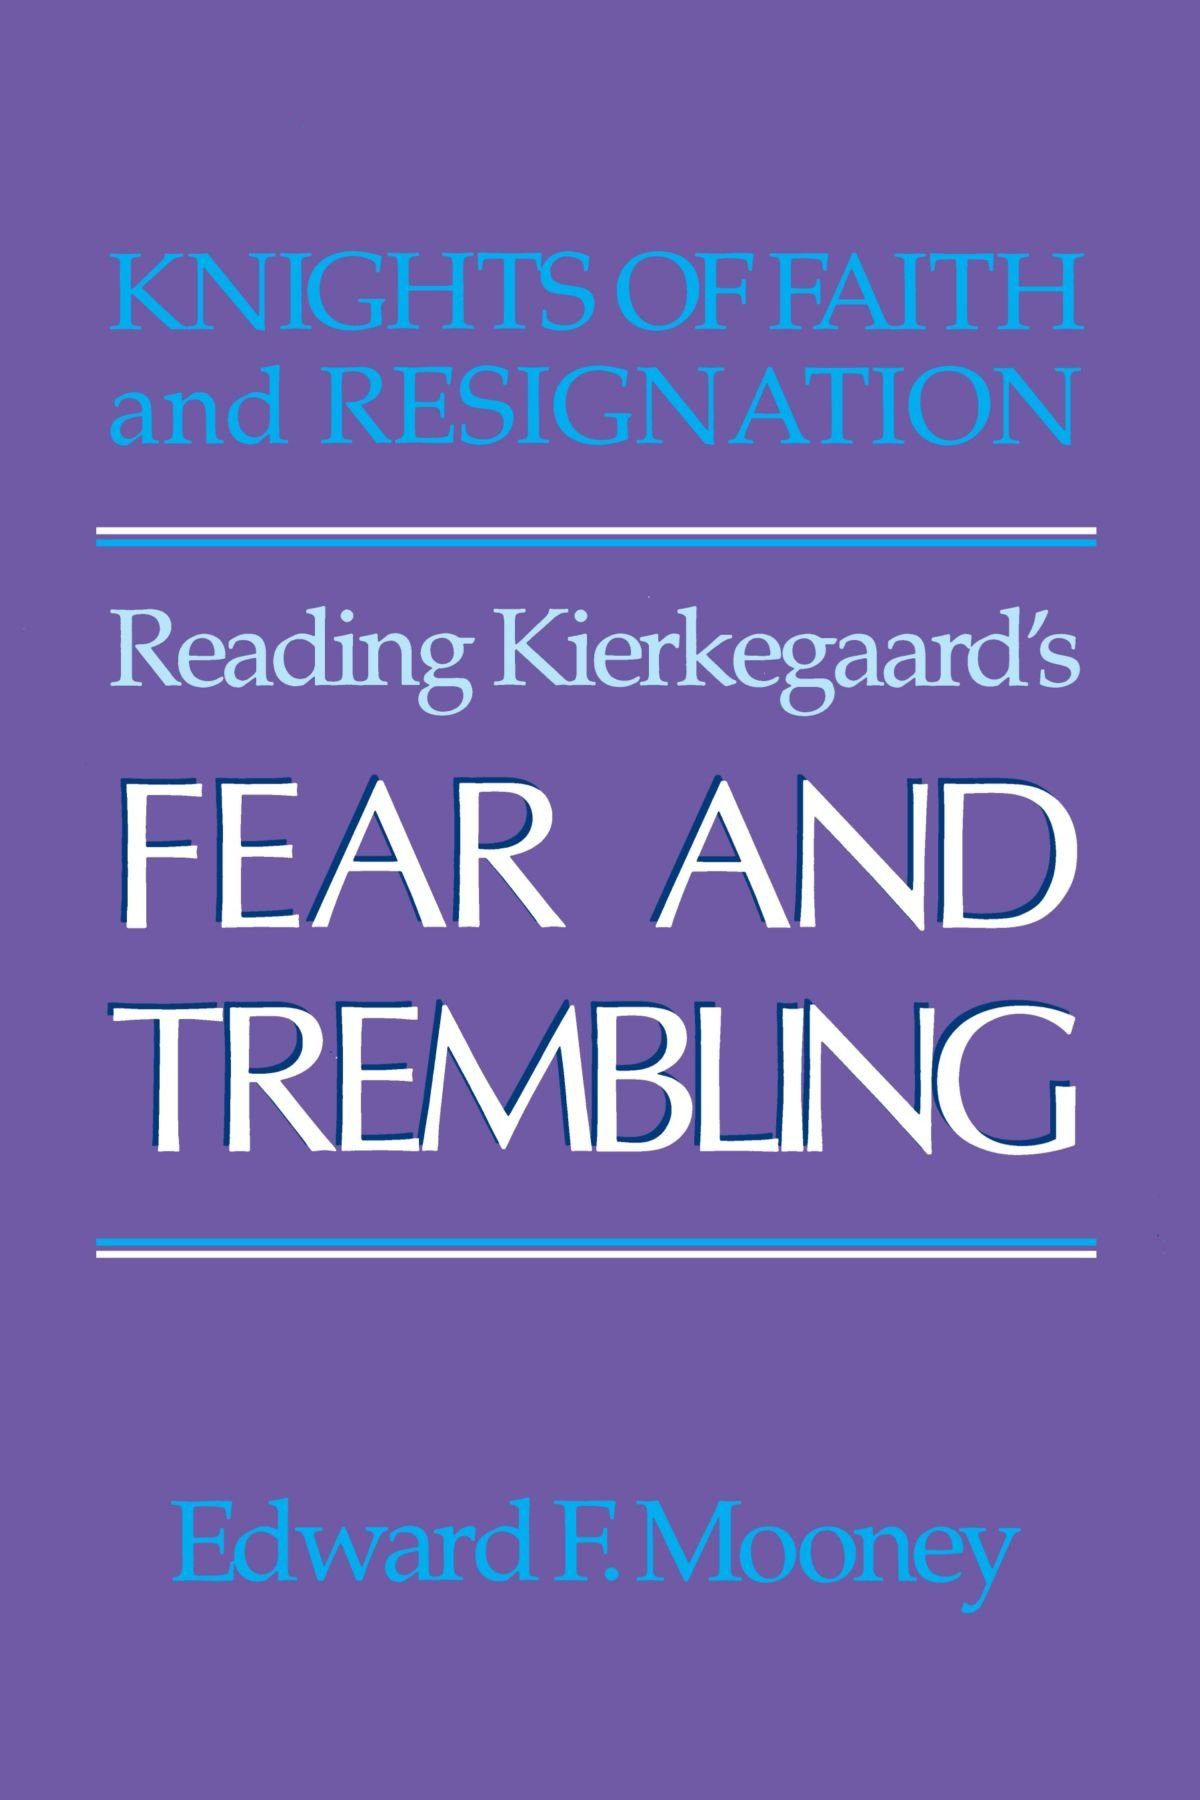 kierkegaard fear and trembling analysis